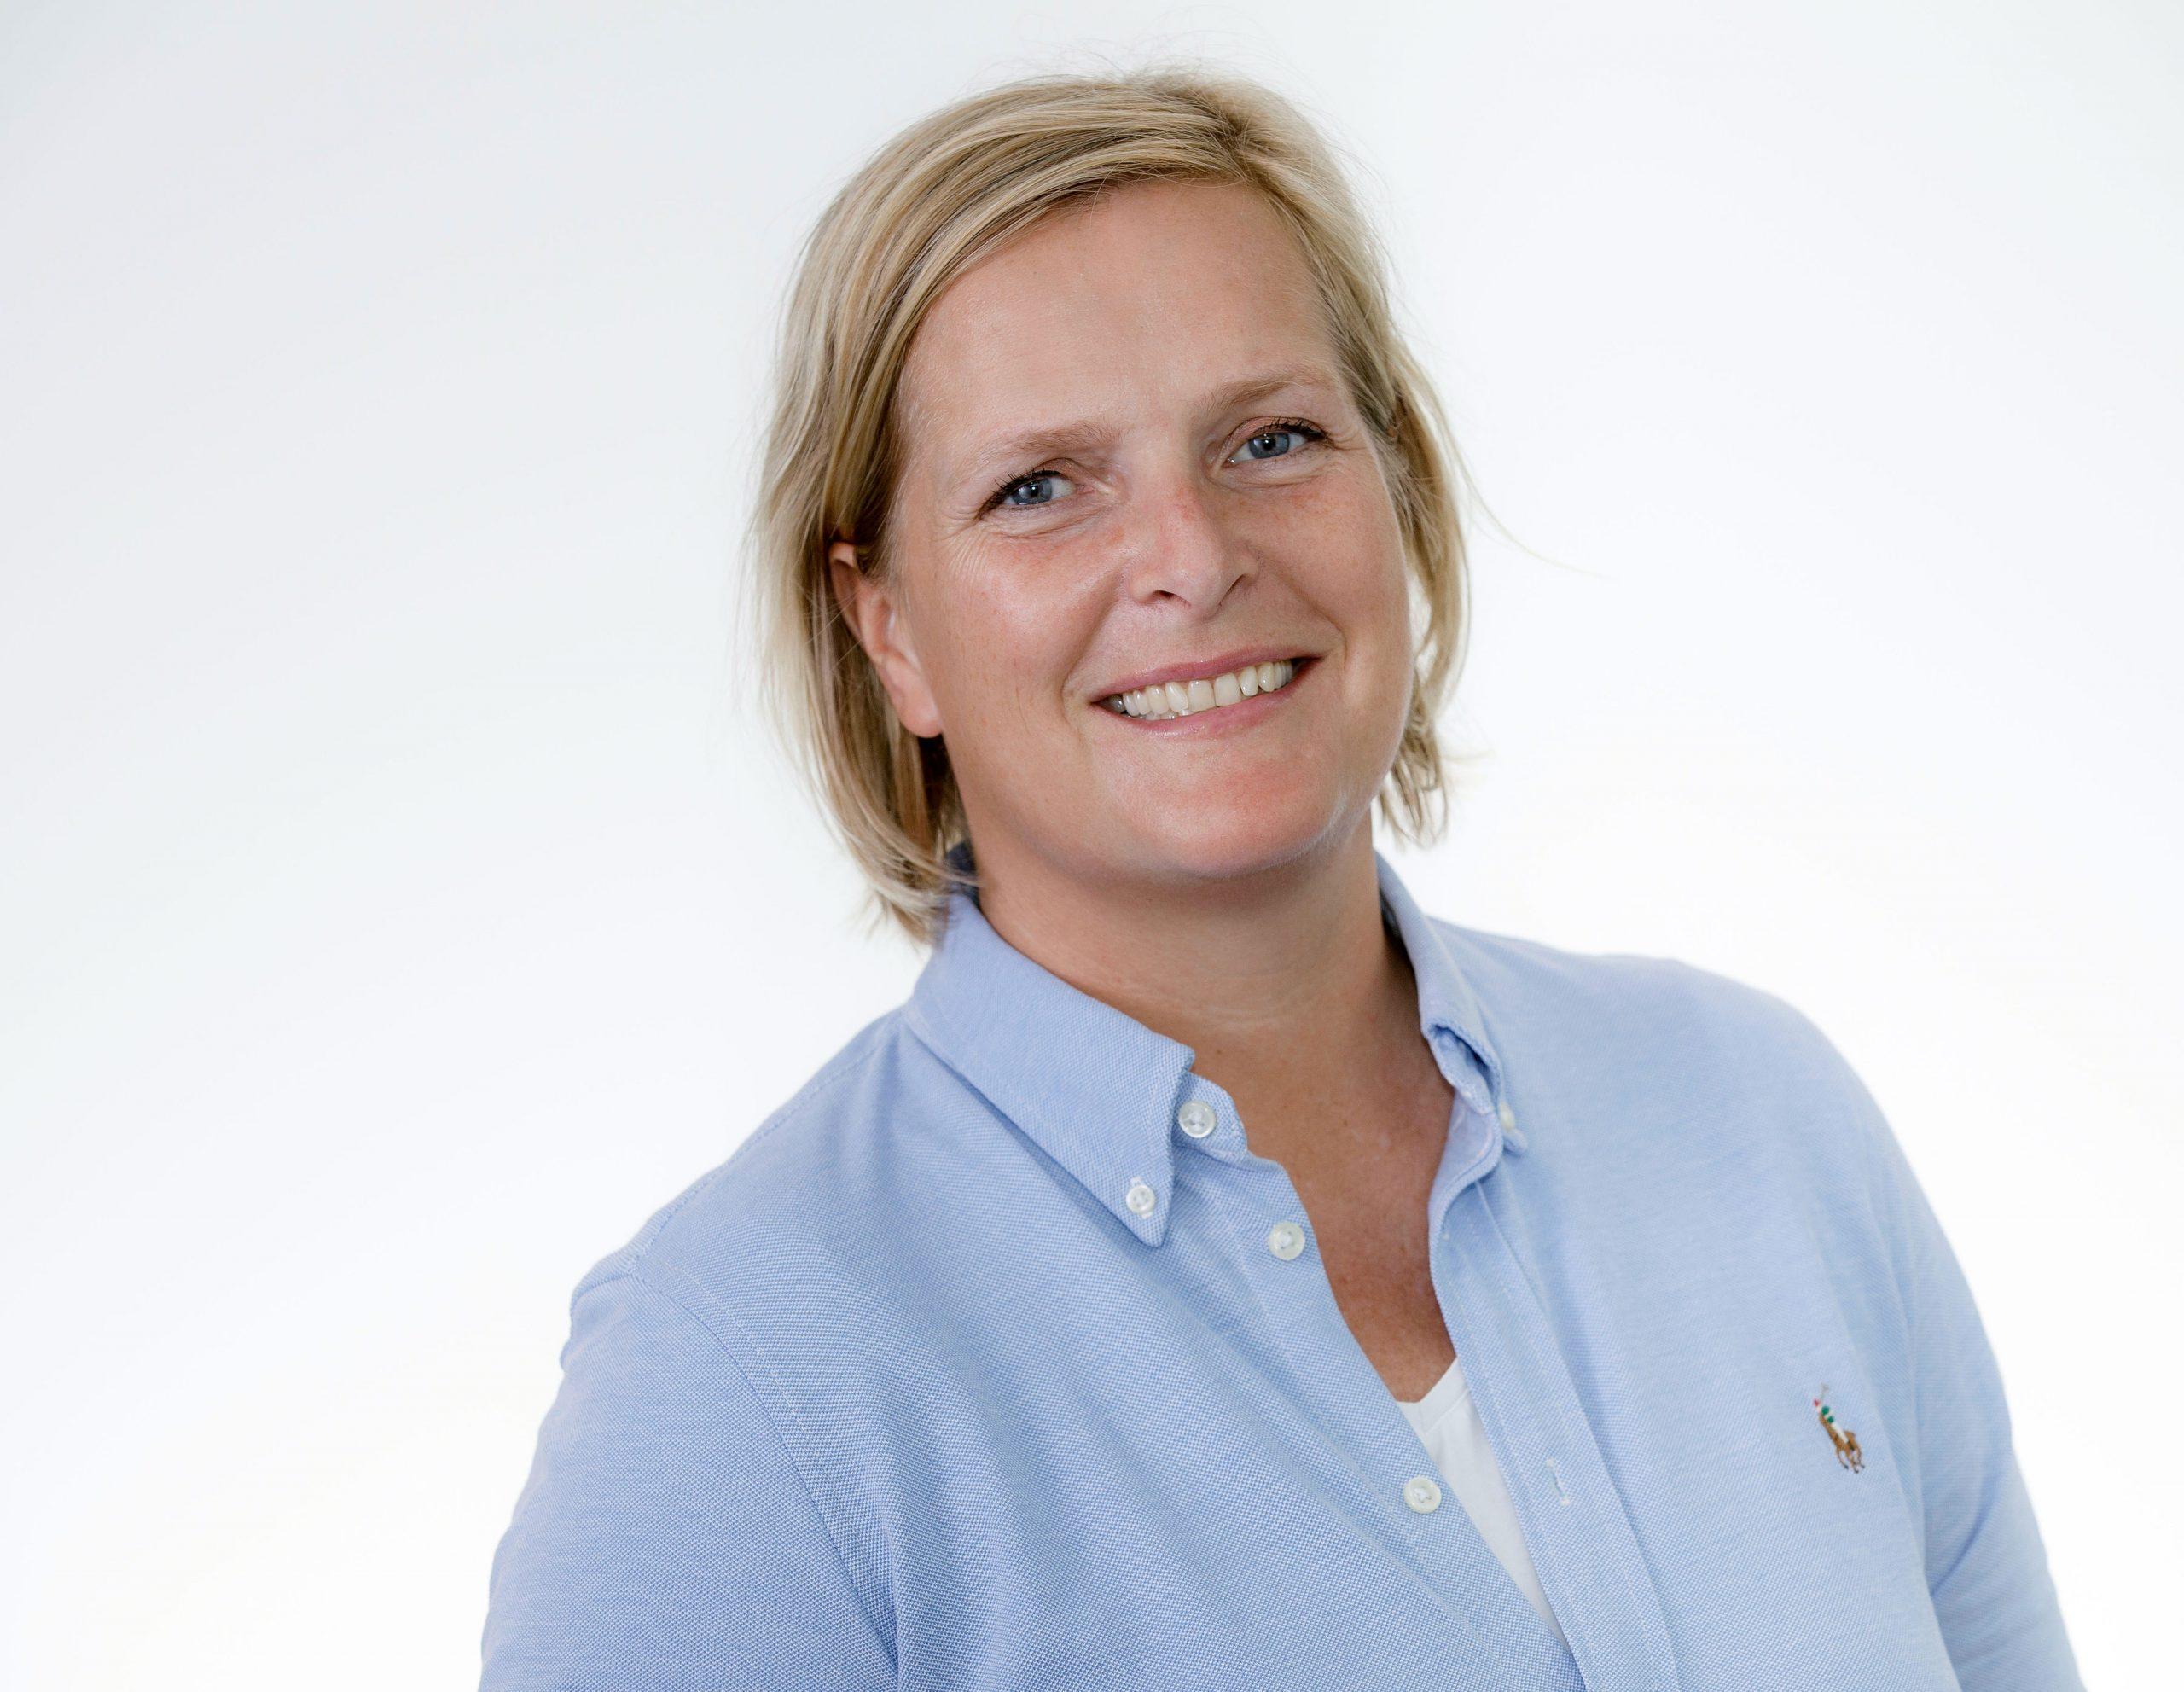 Specialist Marietta Bertleff